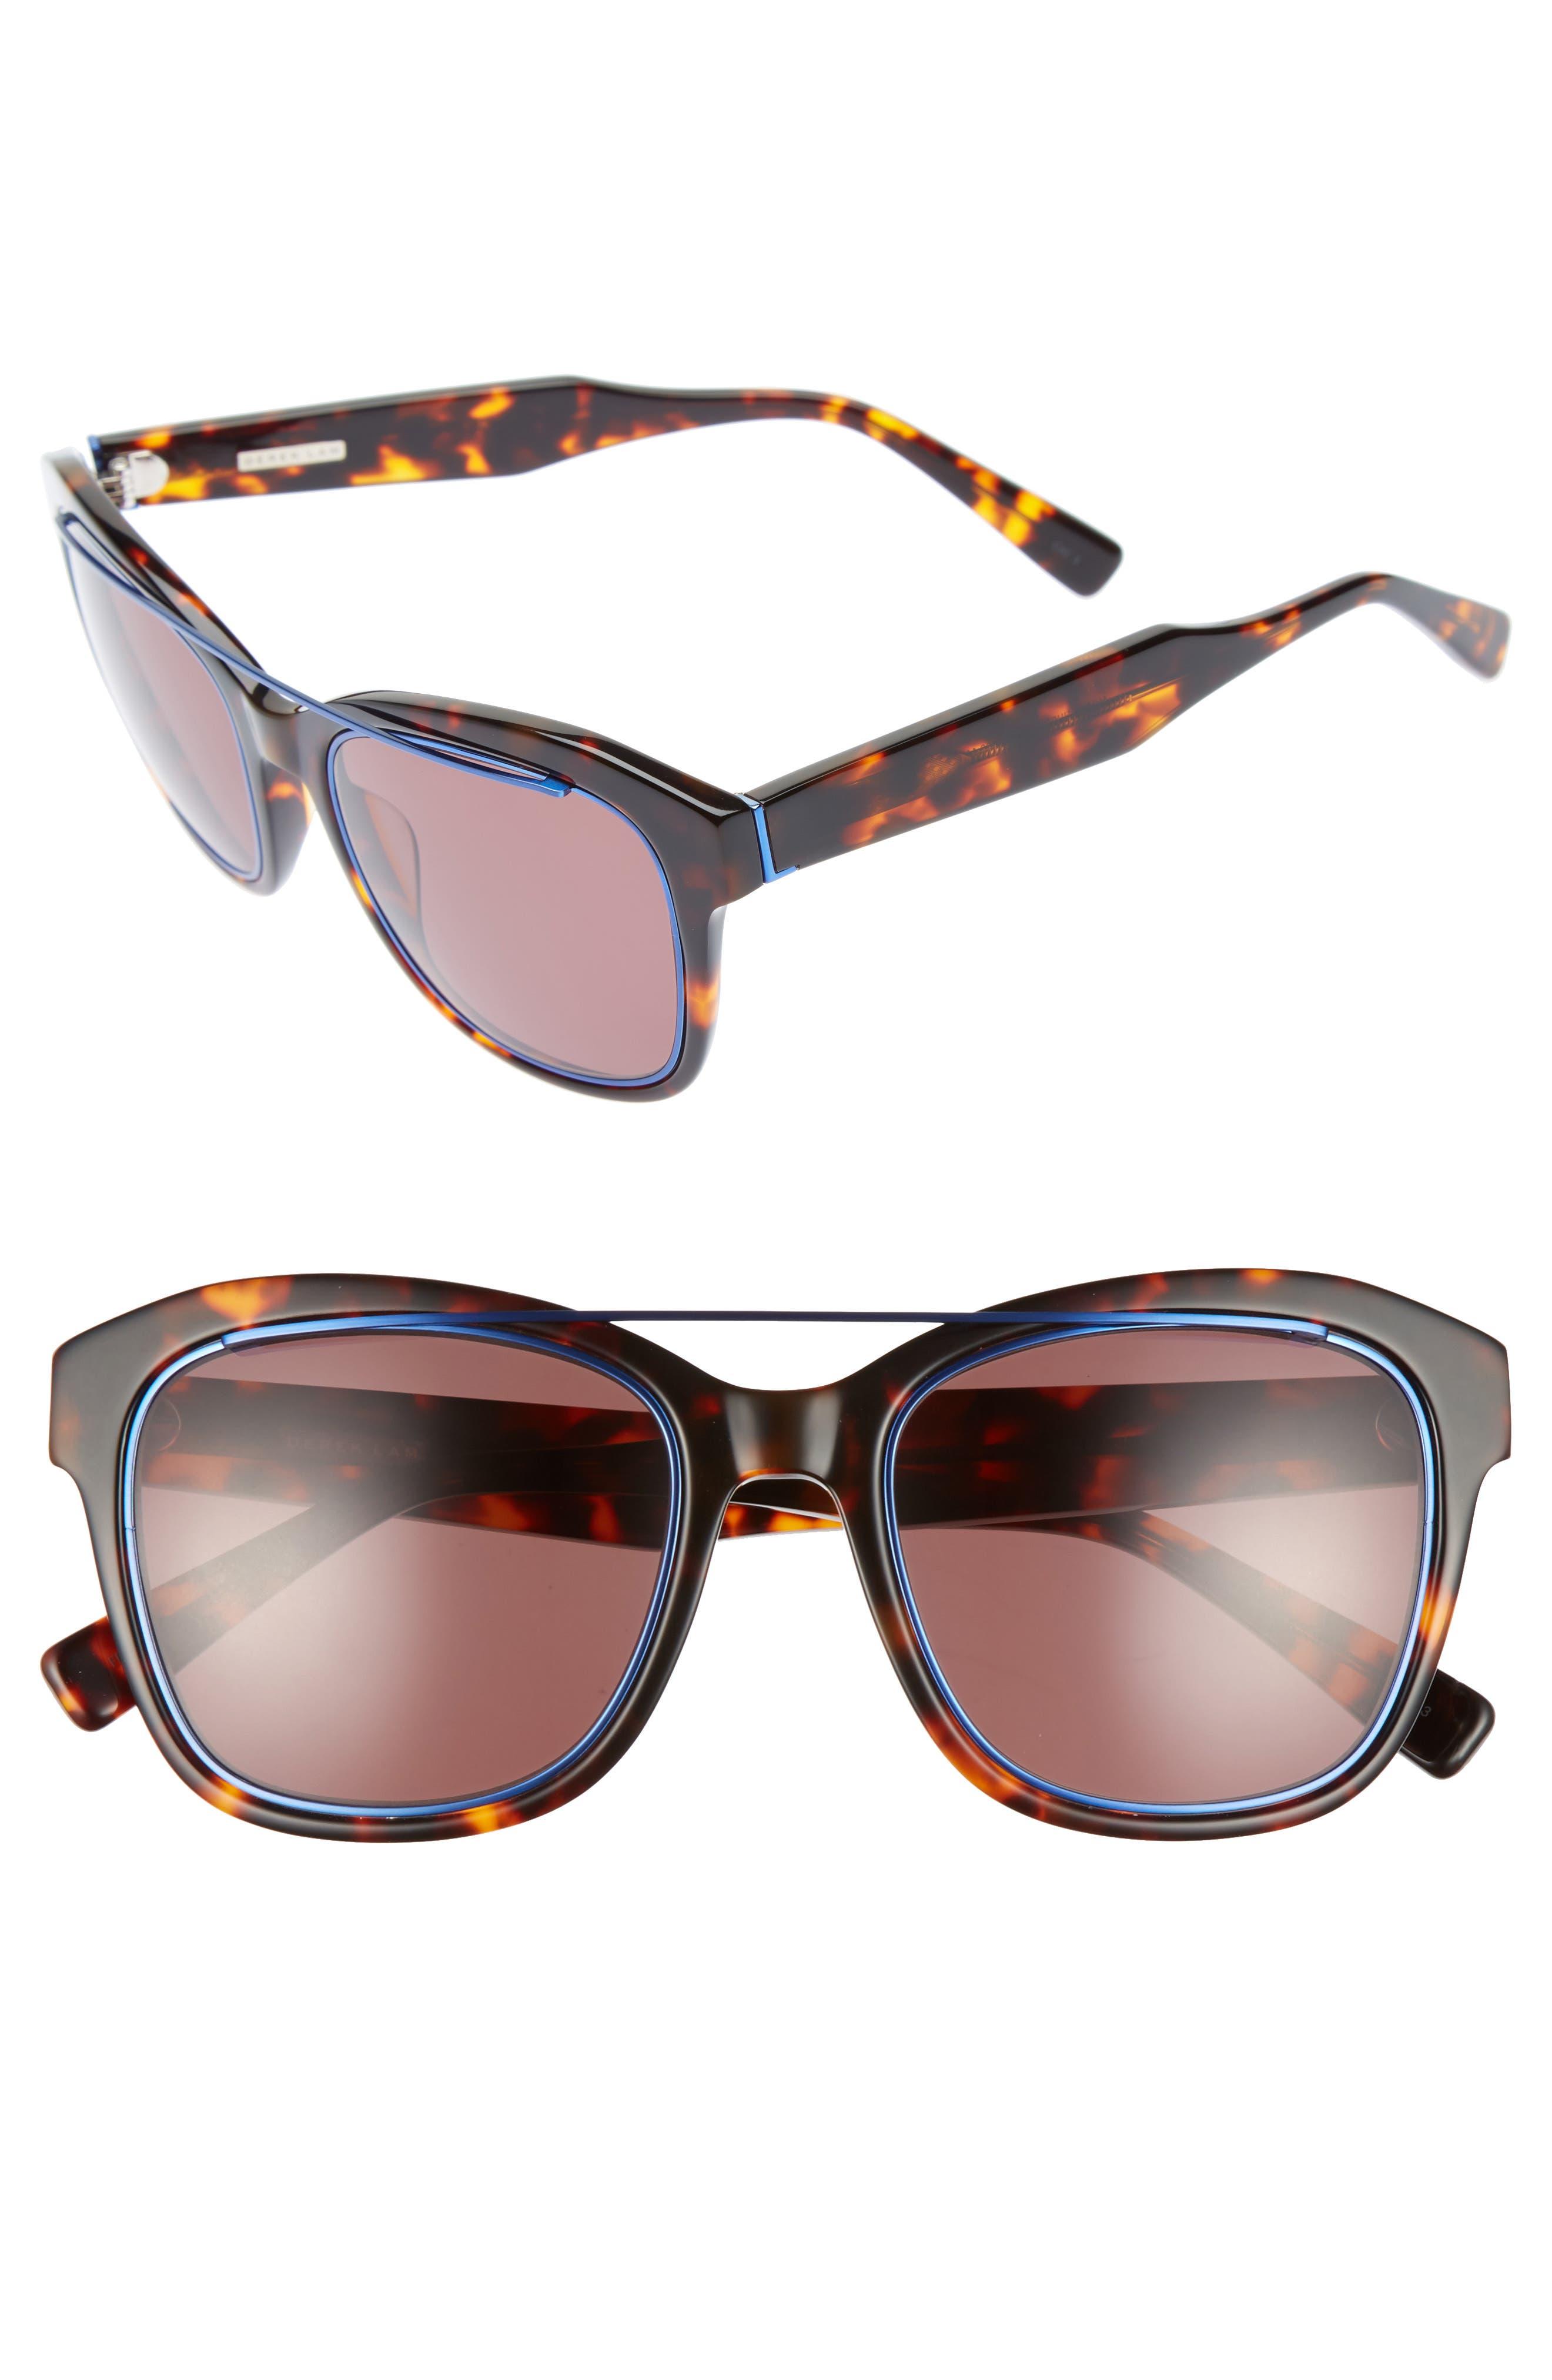 Hudson 52mm Gradient Sunglasses,                         Main,                         color, Havana Tortoise